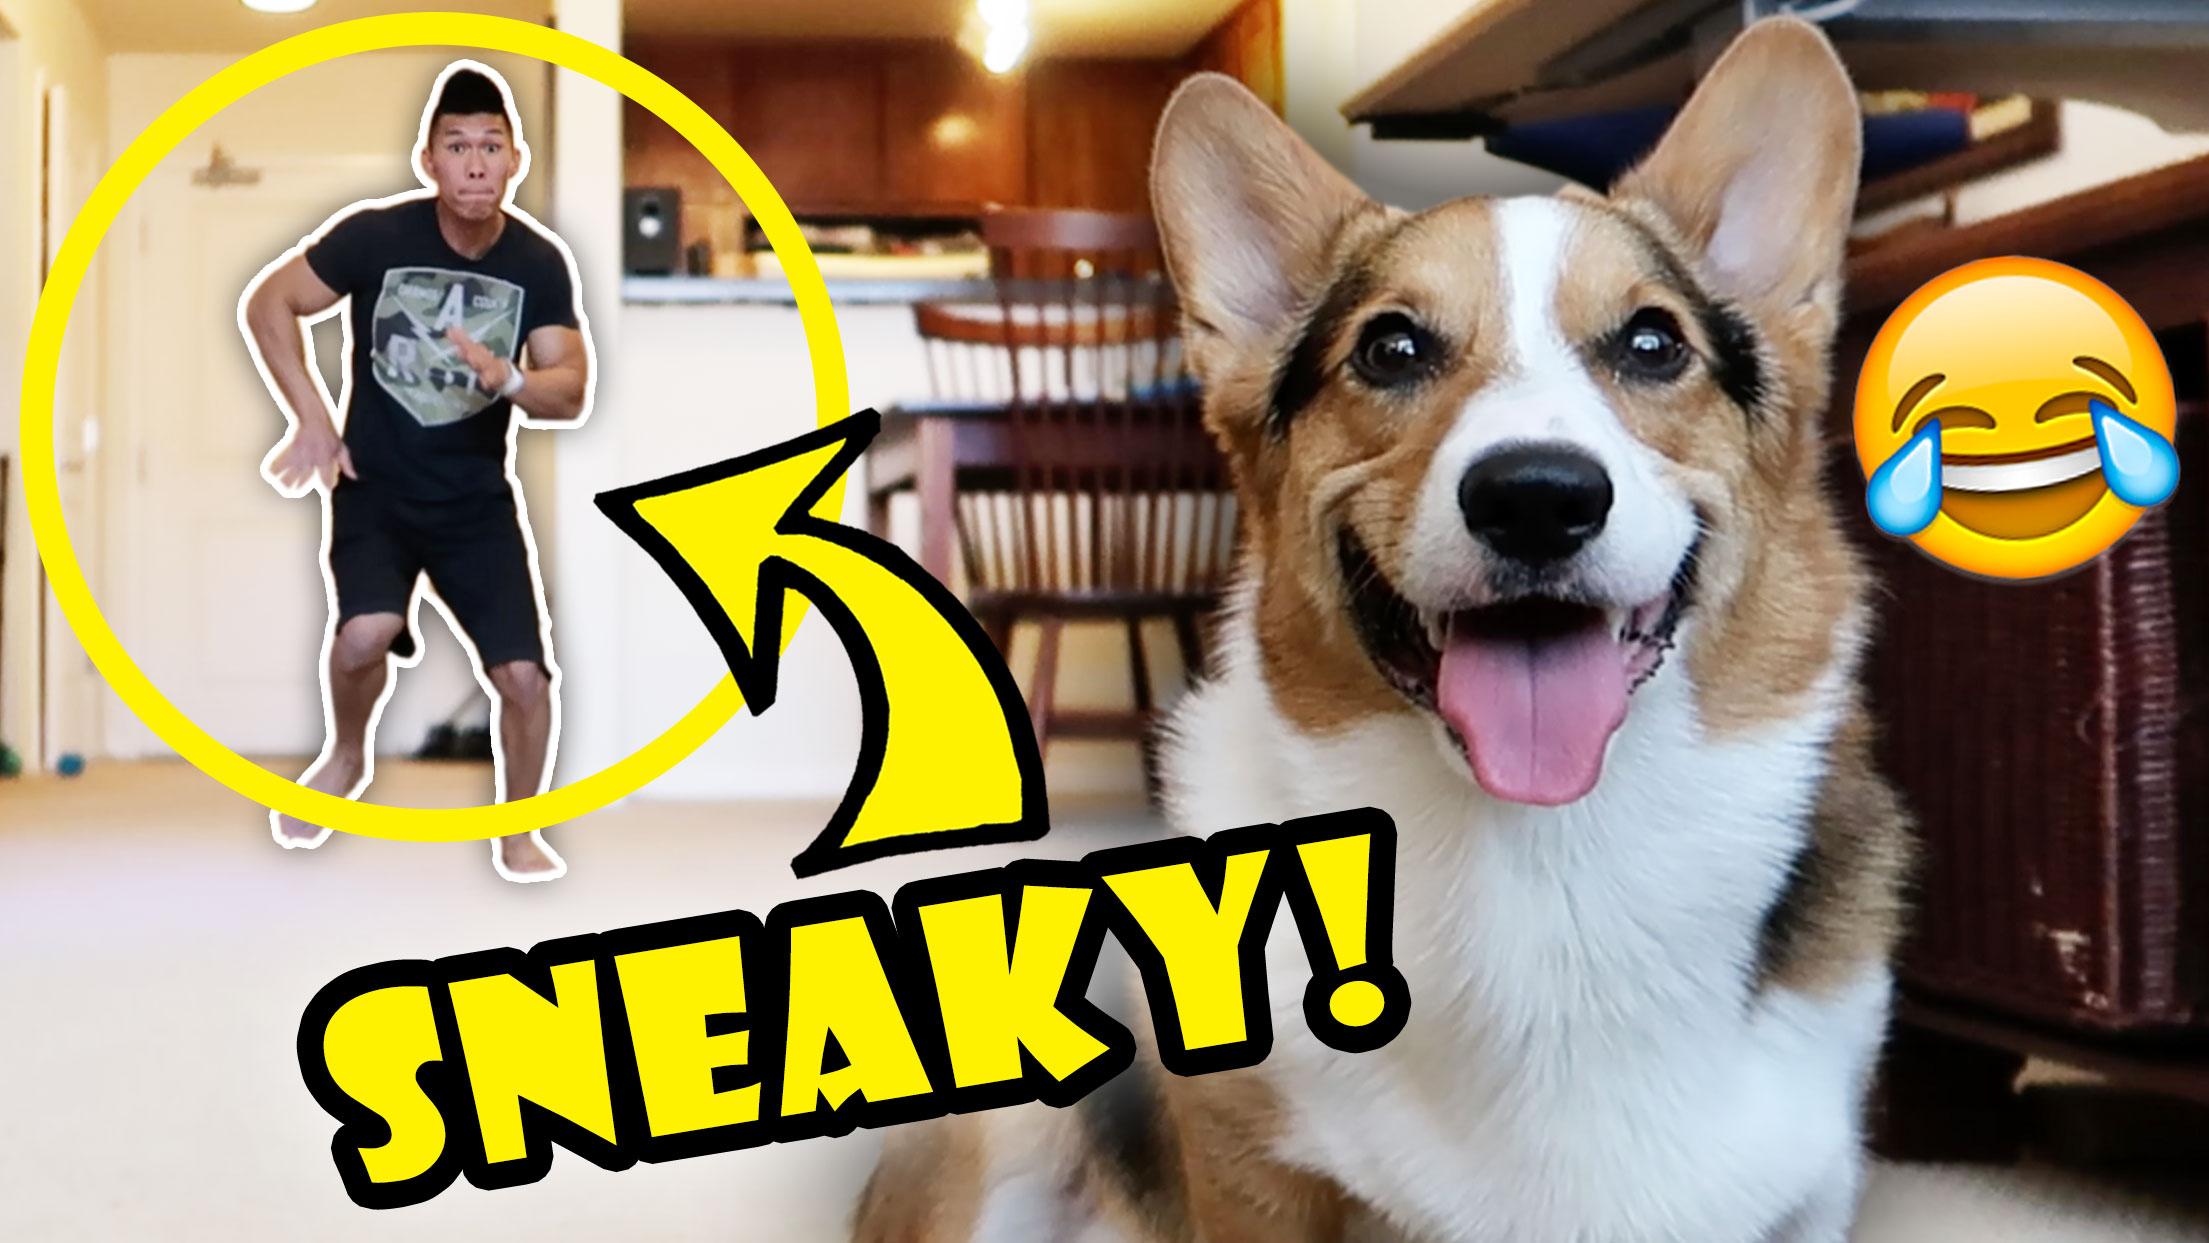 DANCING BEHIND CORGI DOG - WILL HE NOTICE?